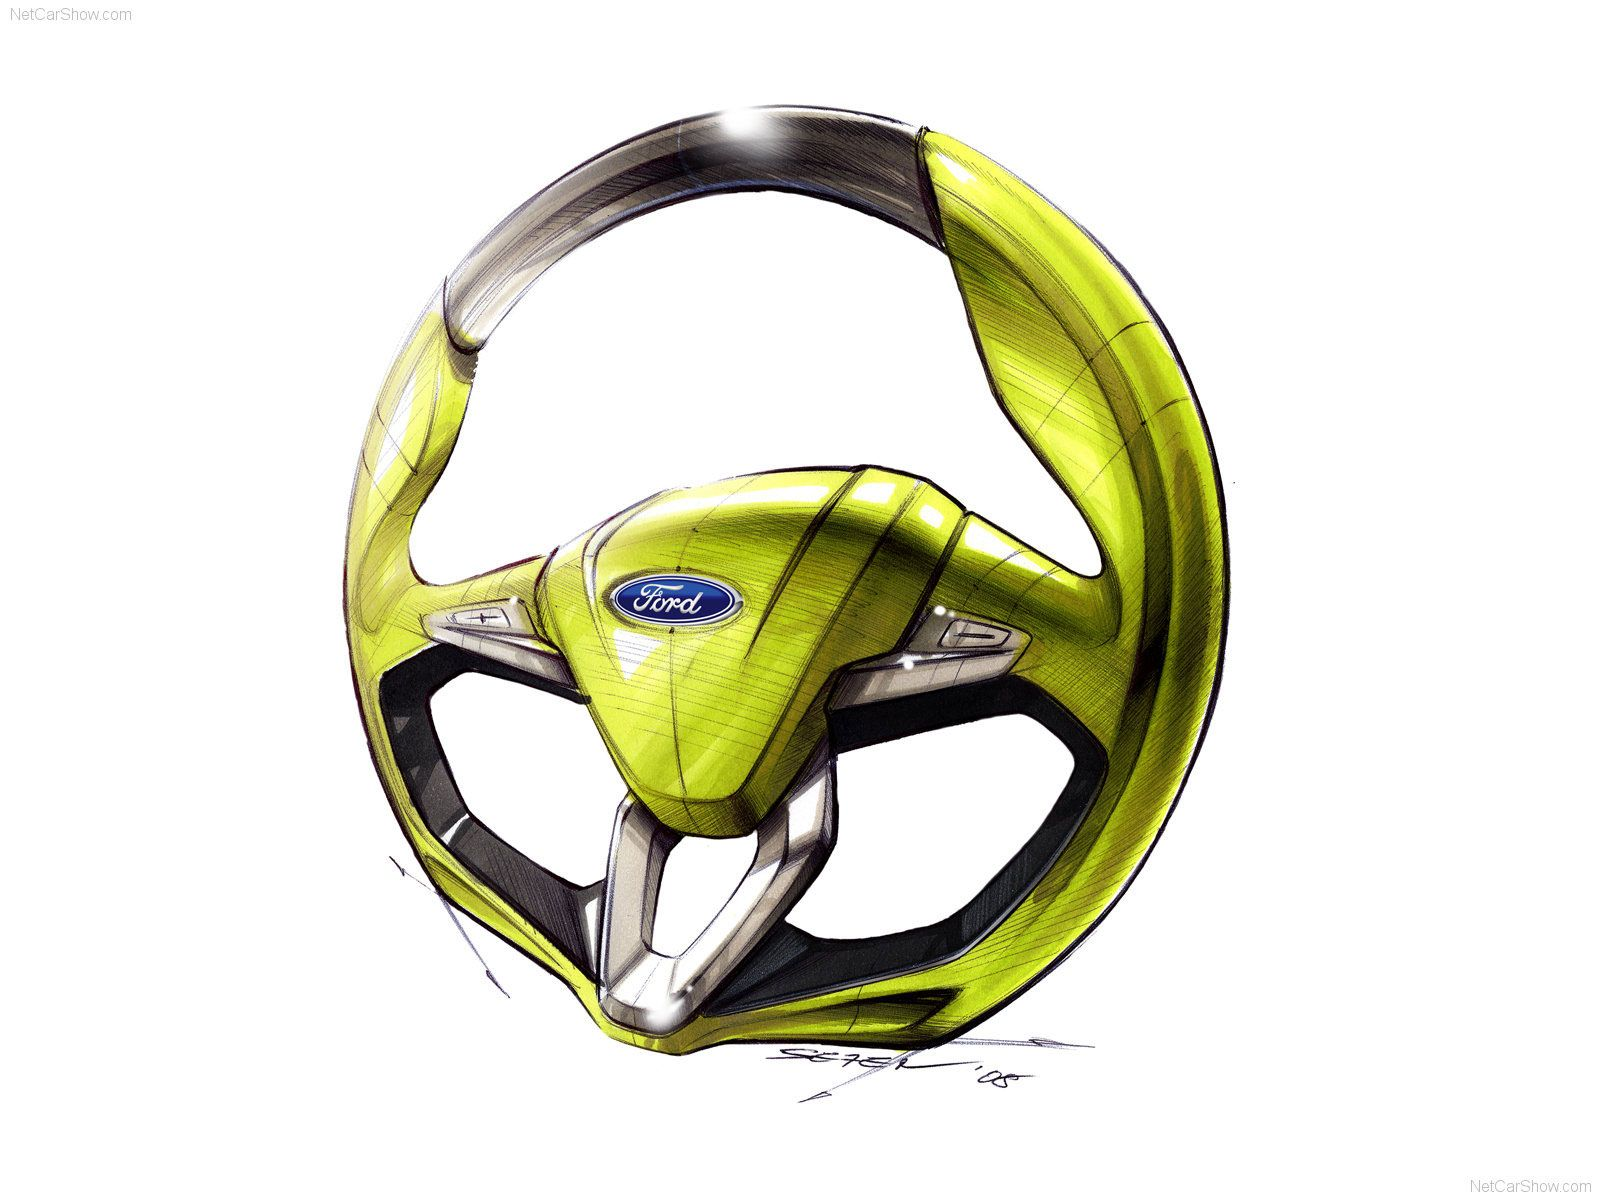 2009 Ford Iosis Max Concept Steering Wheel Design Sketch Dizajn